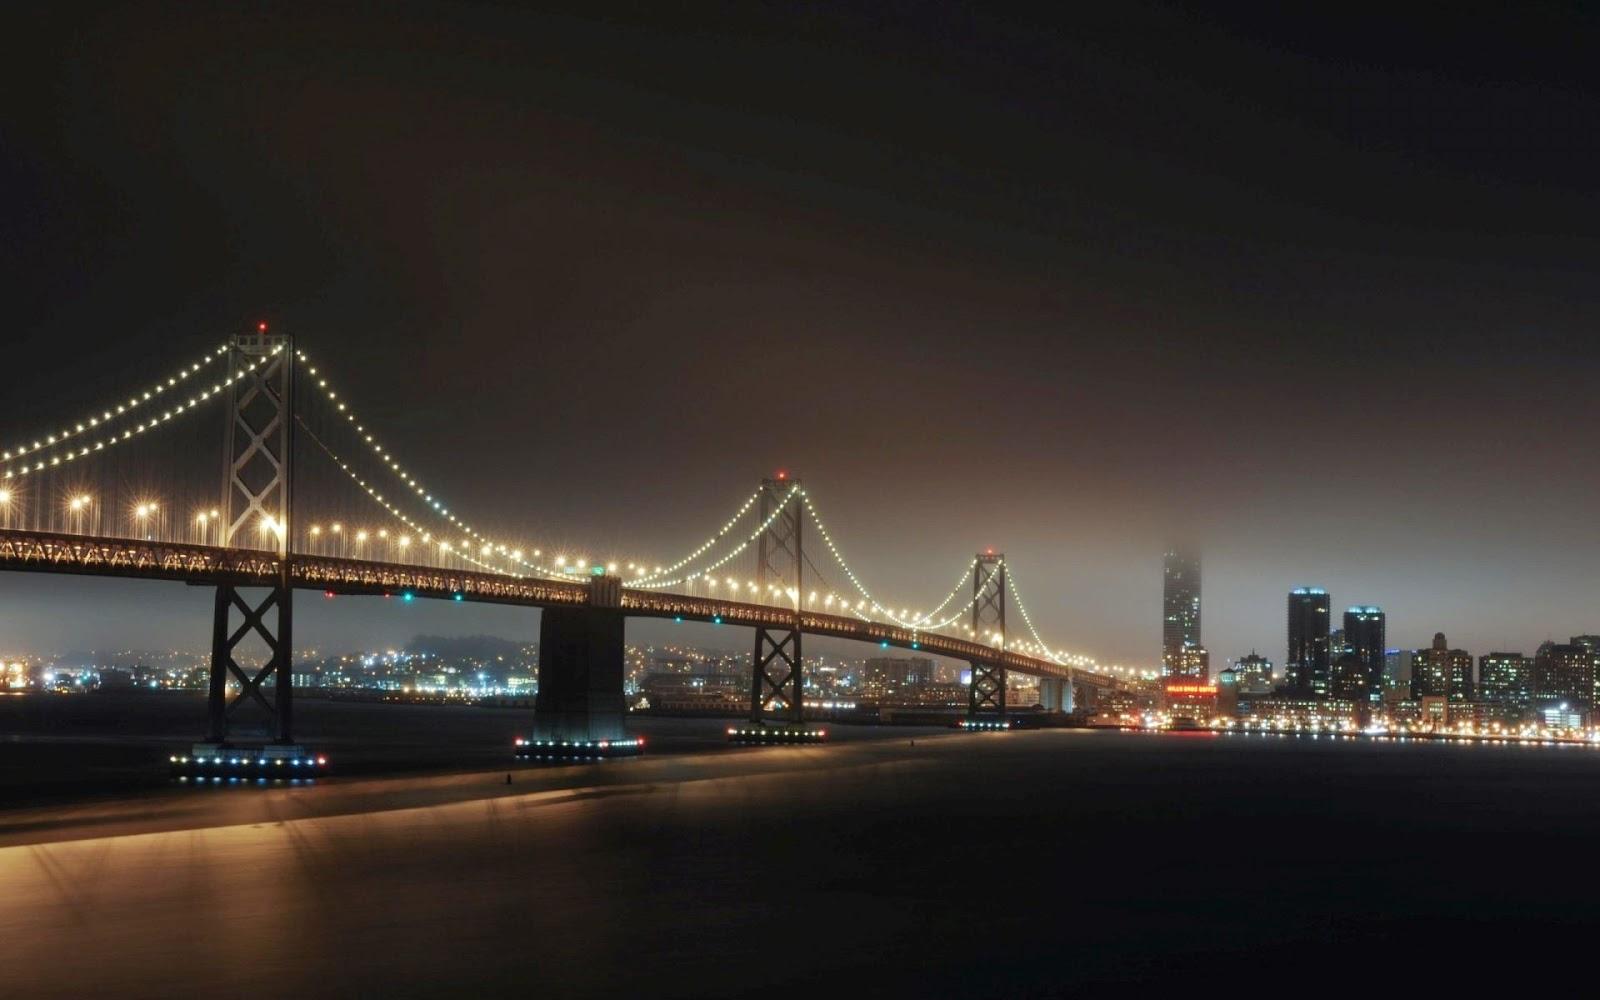 light bridge wallpaper - photo #9